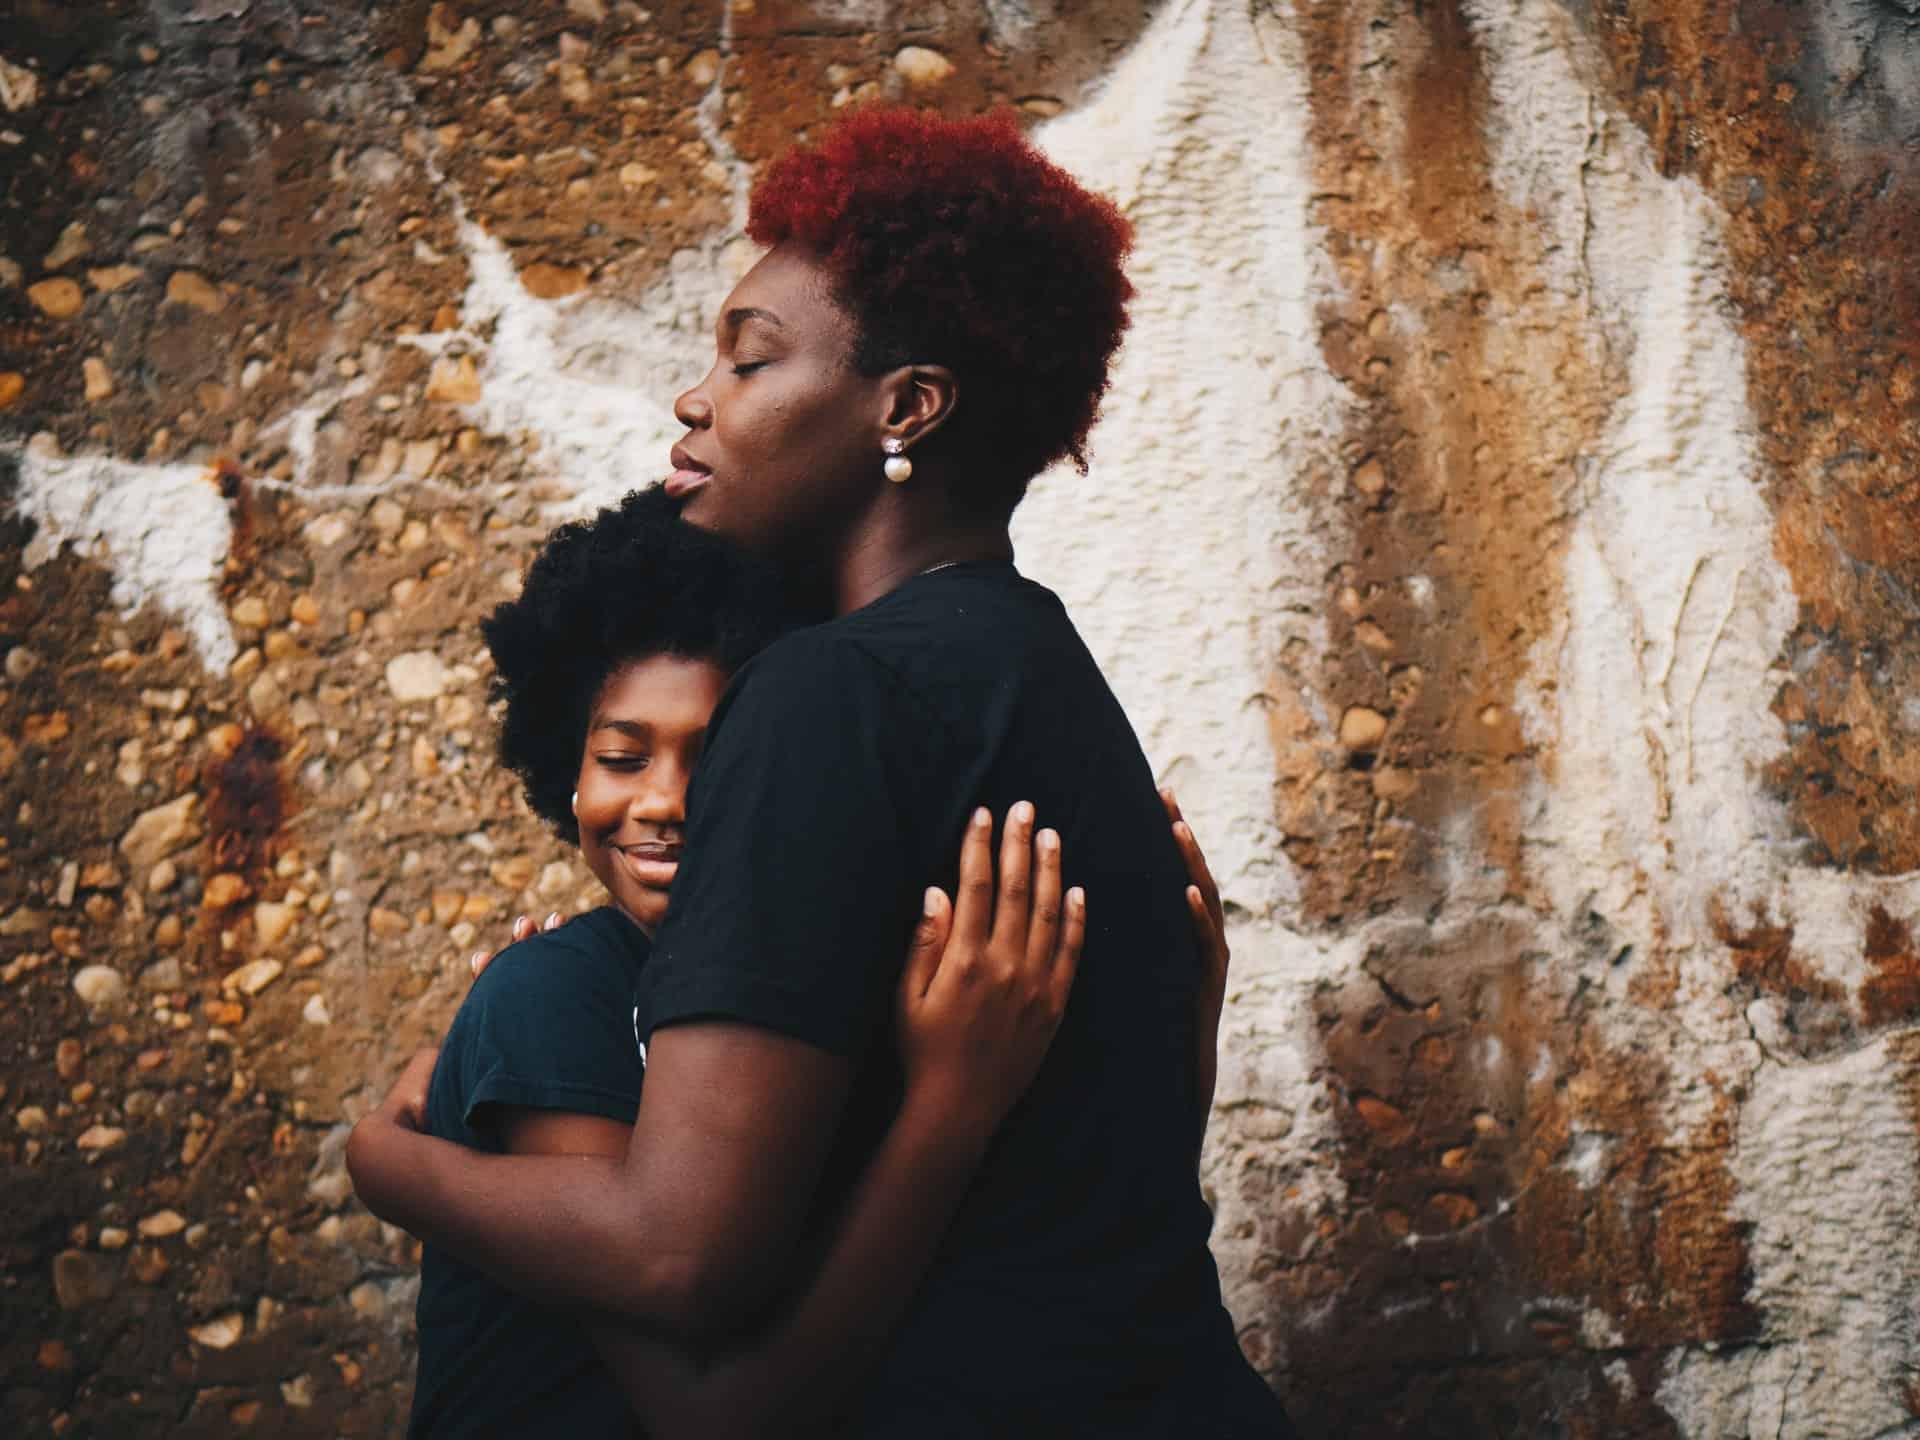 https://nccf-cares.org/wp-content/uploads/2021/08/two_women_hug.jpg